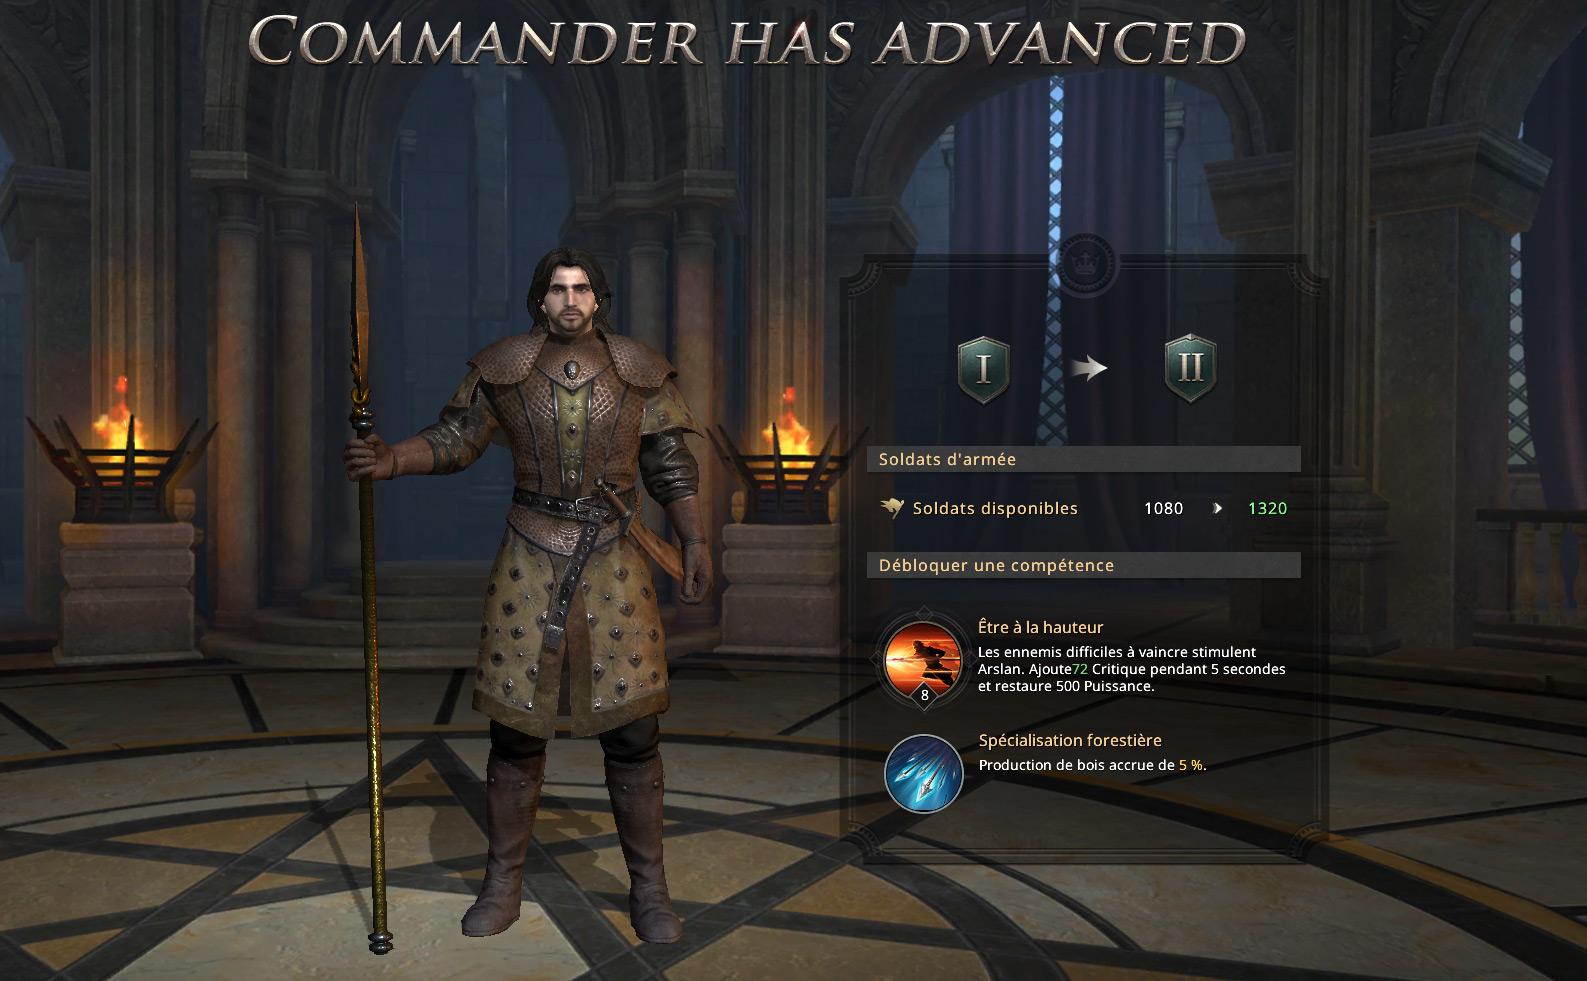 Commandant Arslan promu au rang II